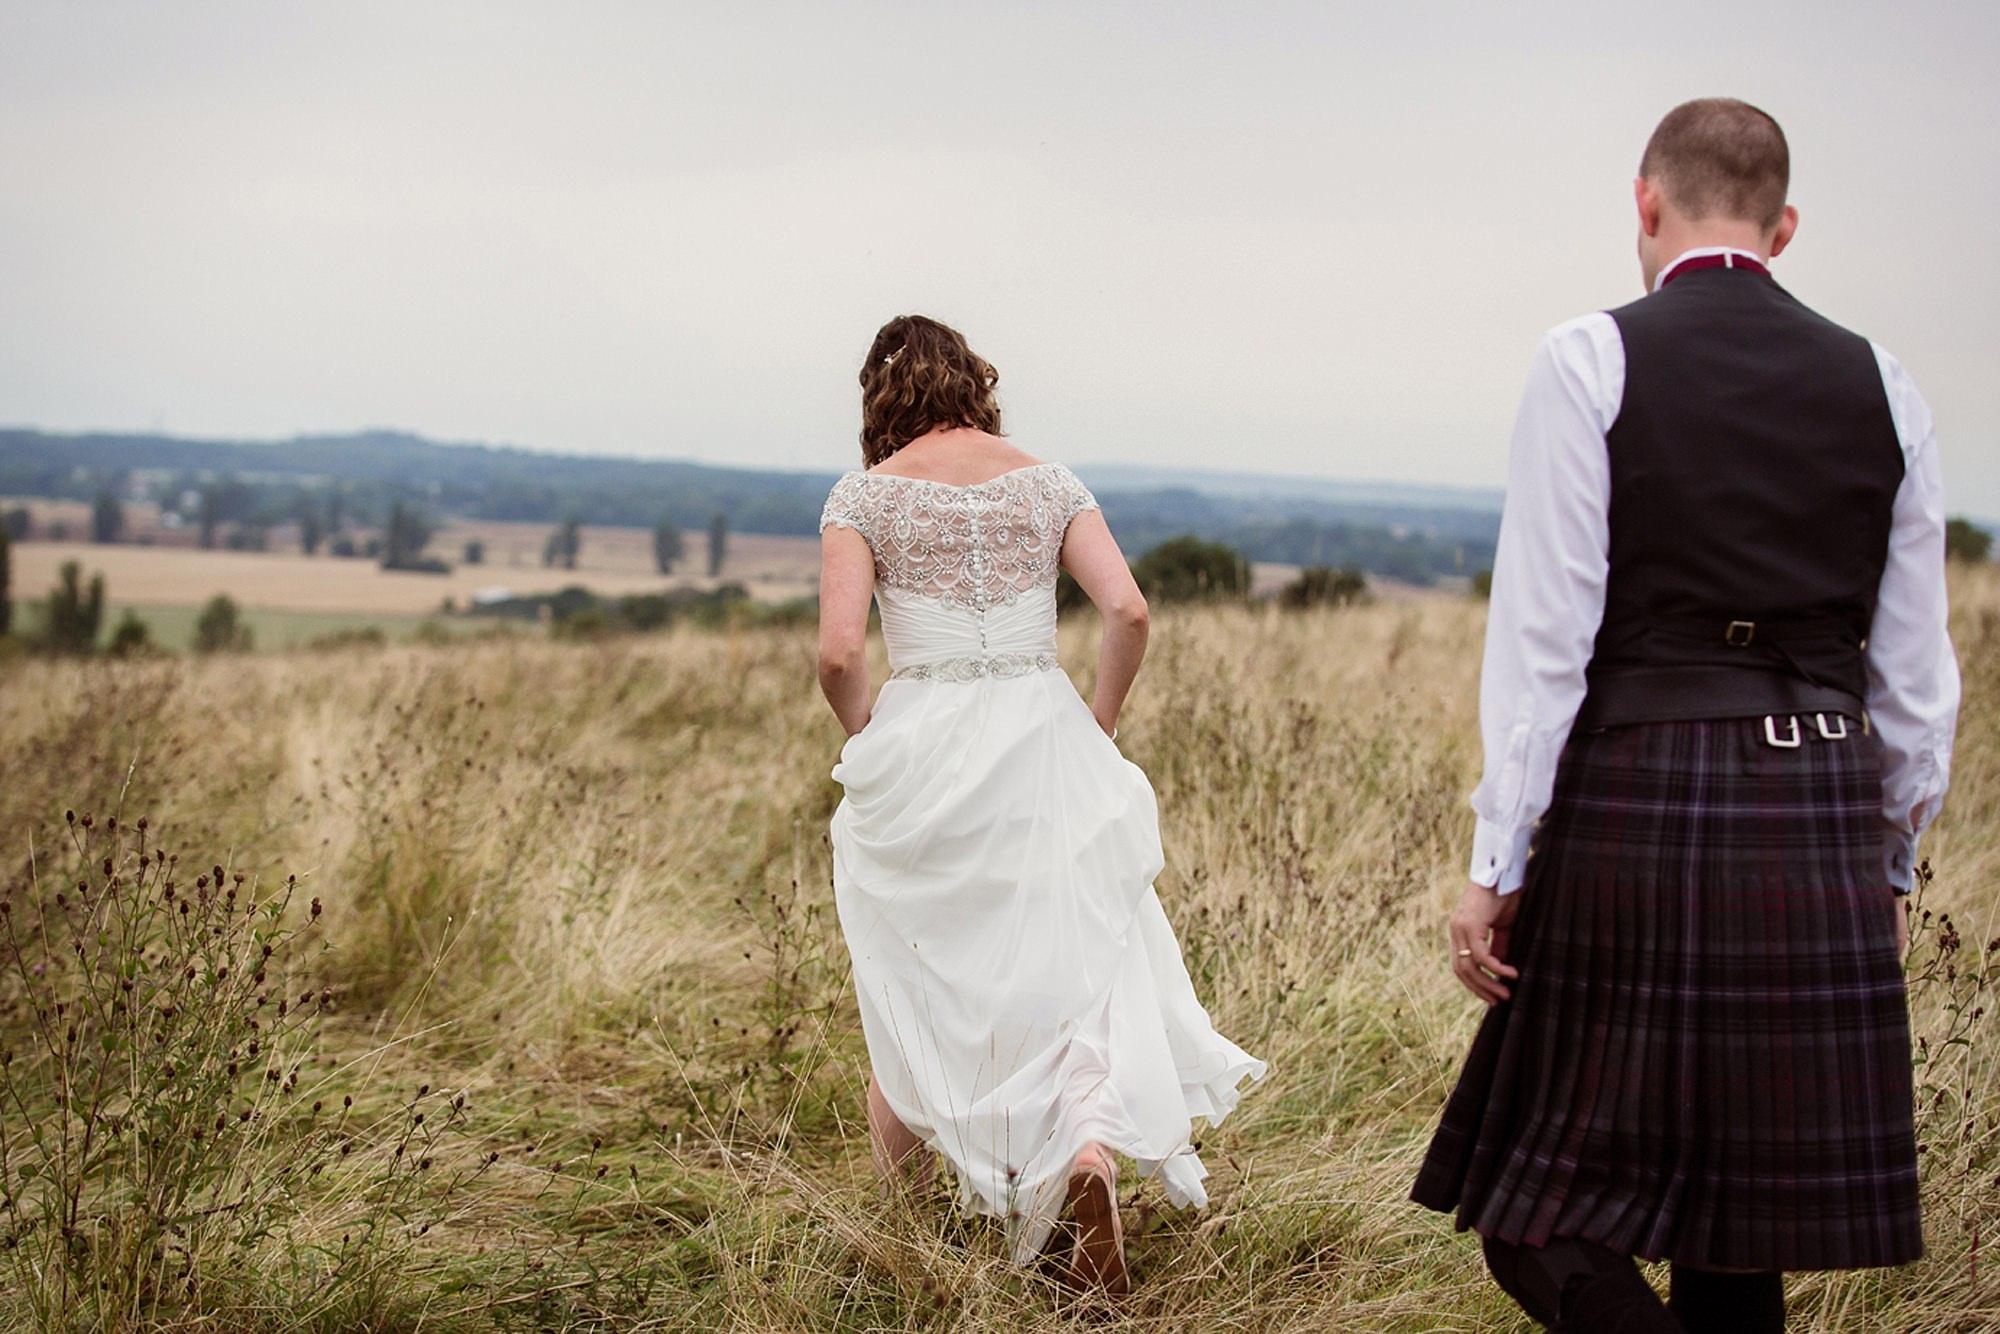 outdoor humanist wedding photography bride walking through grass